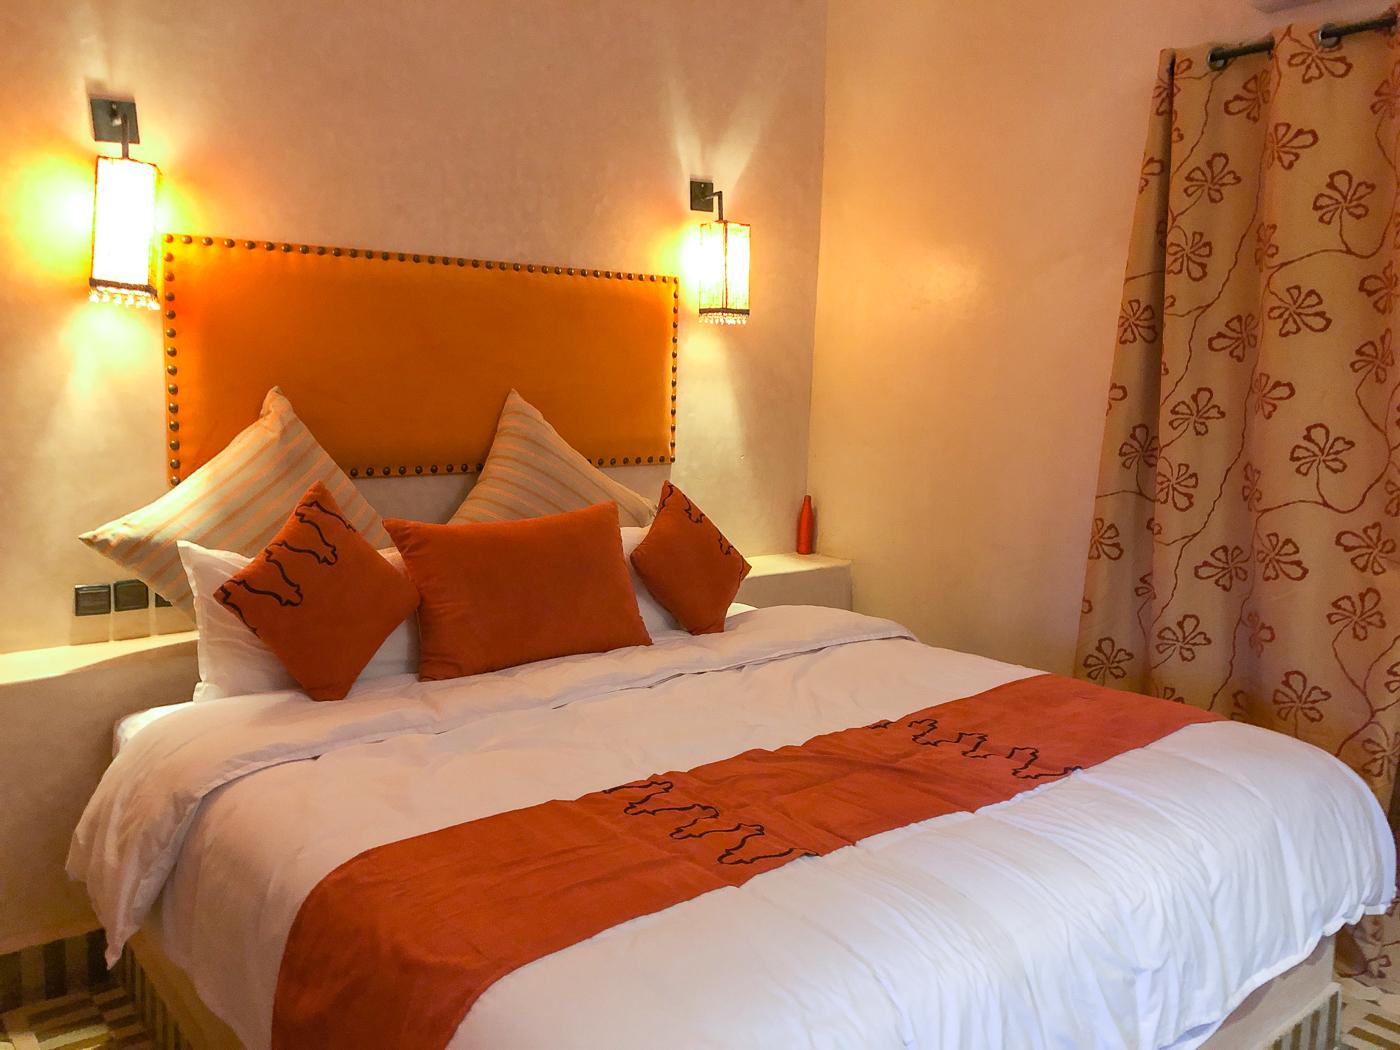 Où dormir dans le désert du Maroc - Riad Azawad à Merzouga - Erg Chebbi